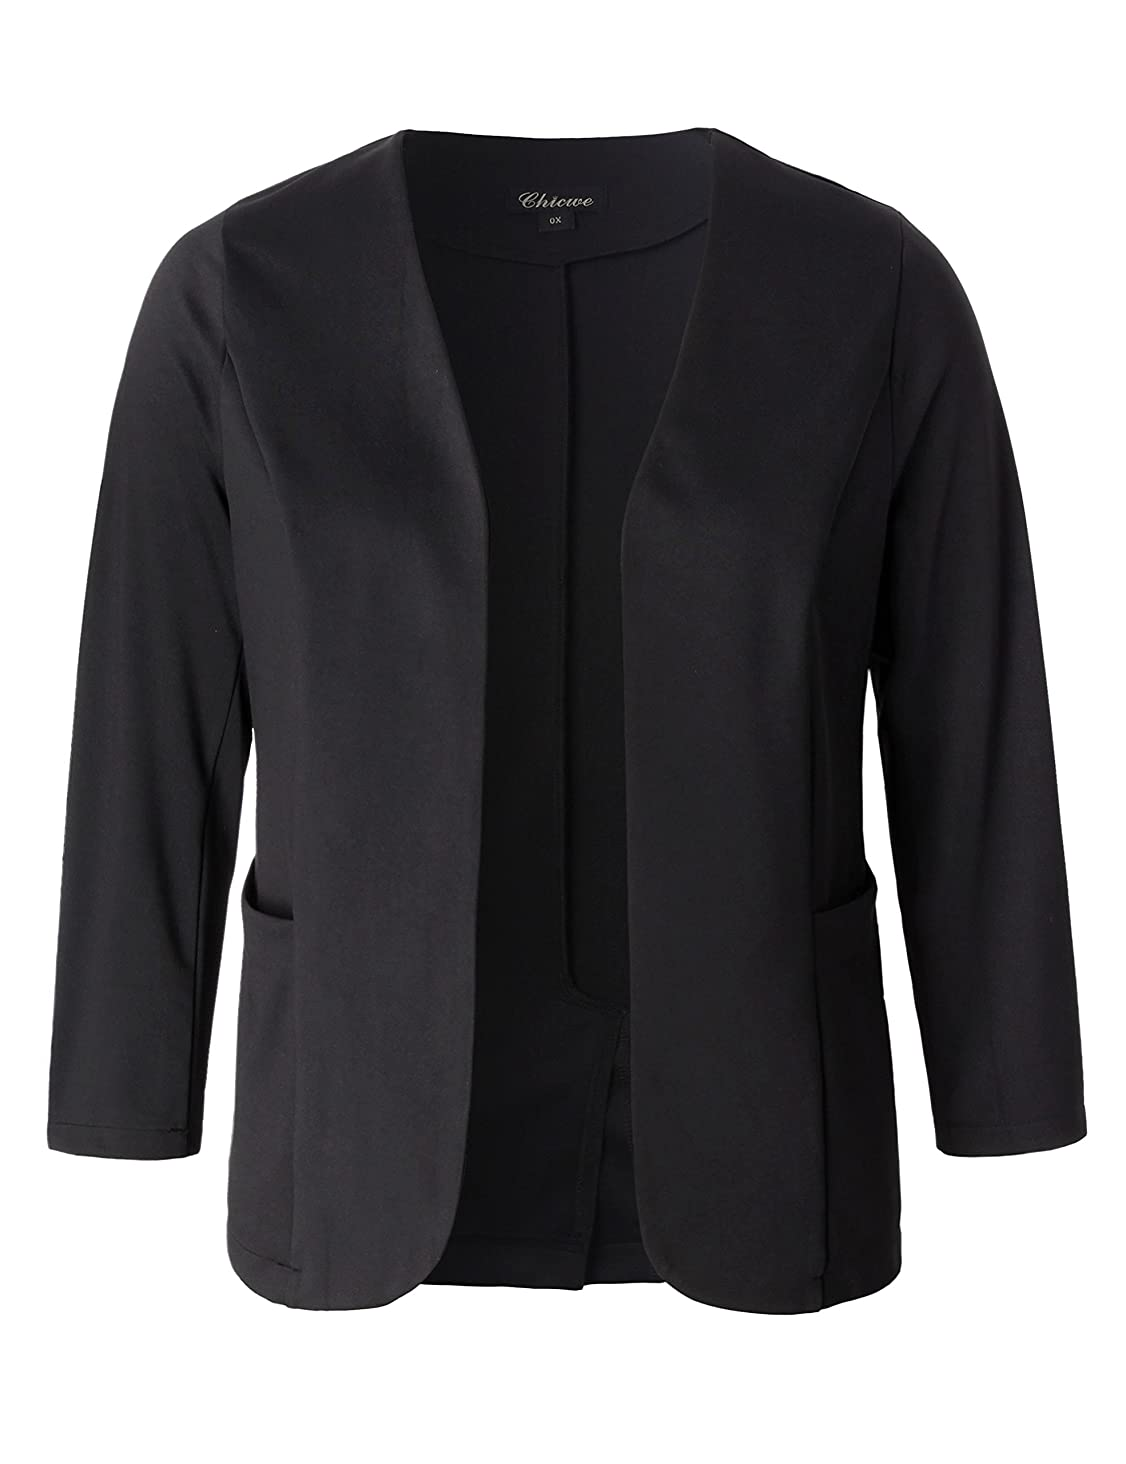 Chicwe Women's Plus Size Stretch Work Chic Outfit Blazer Jacket Pockets